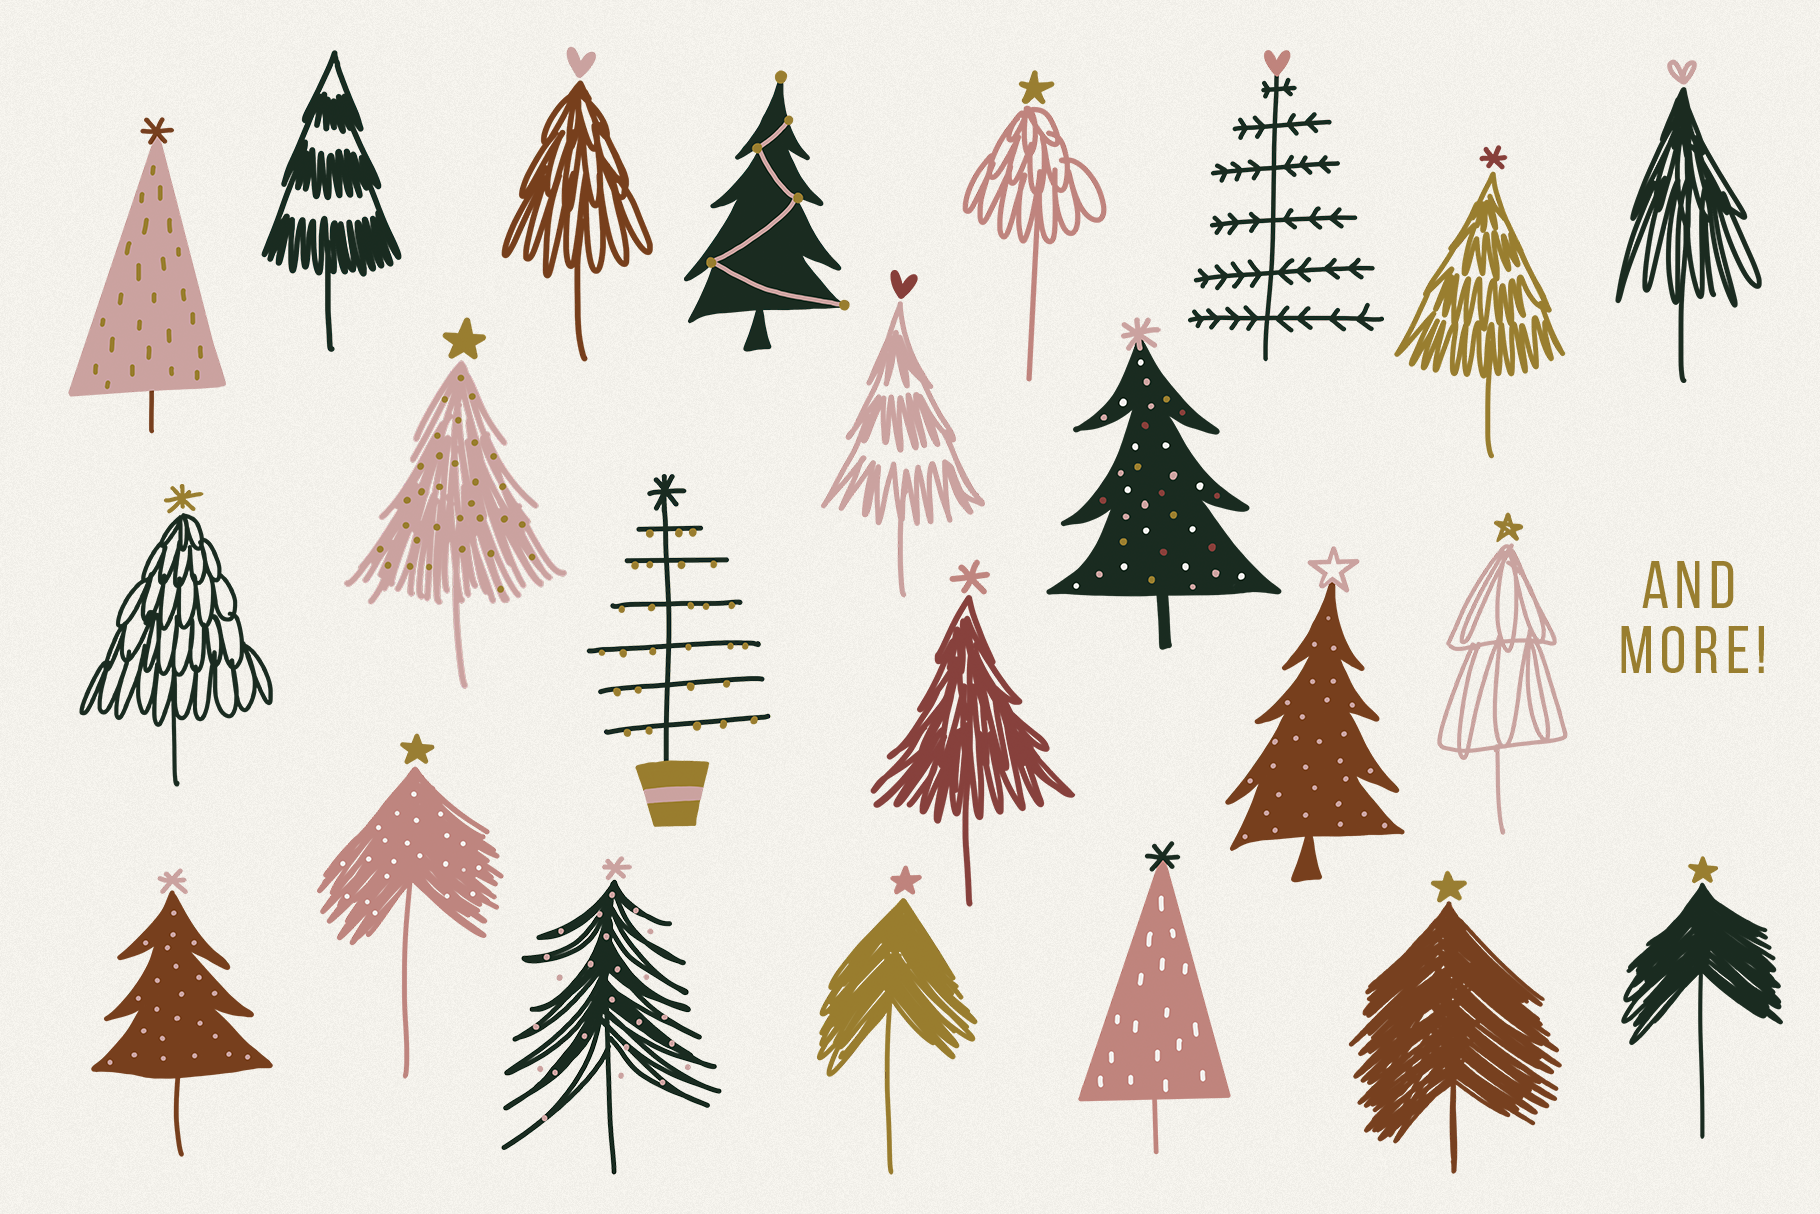 Modern Messy Christmas Tree Illustrations Clip Art By Ka Designs Thehungryjpeg Com